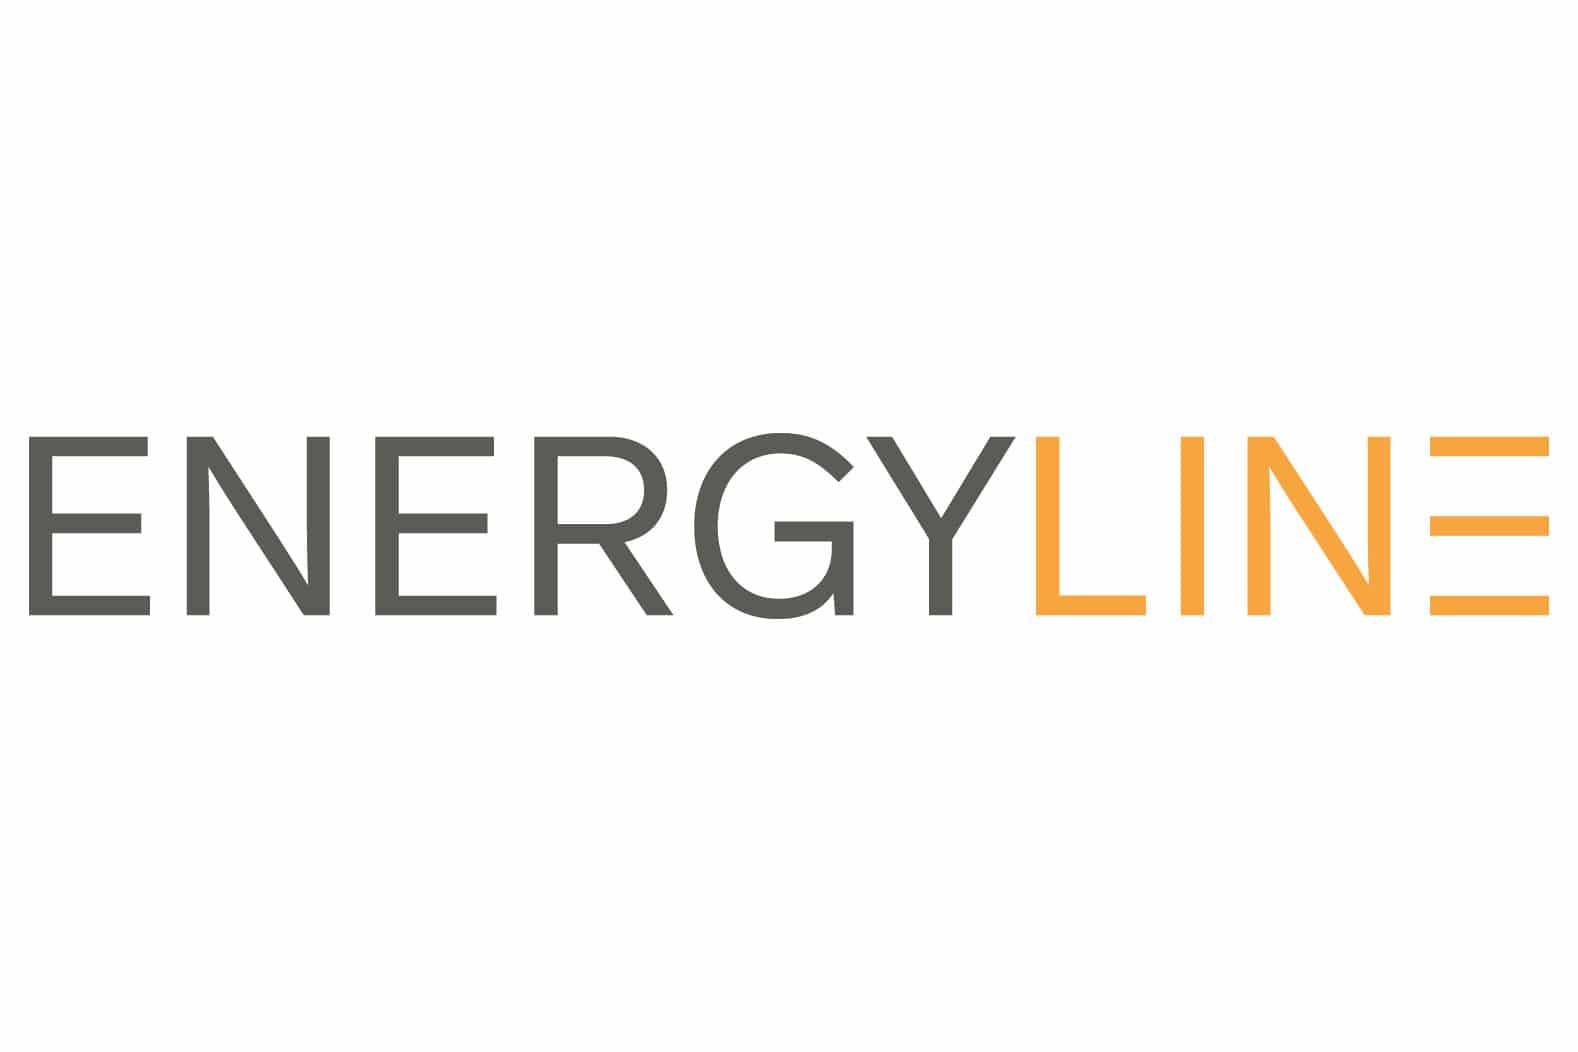 Energyline-logo